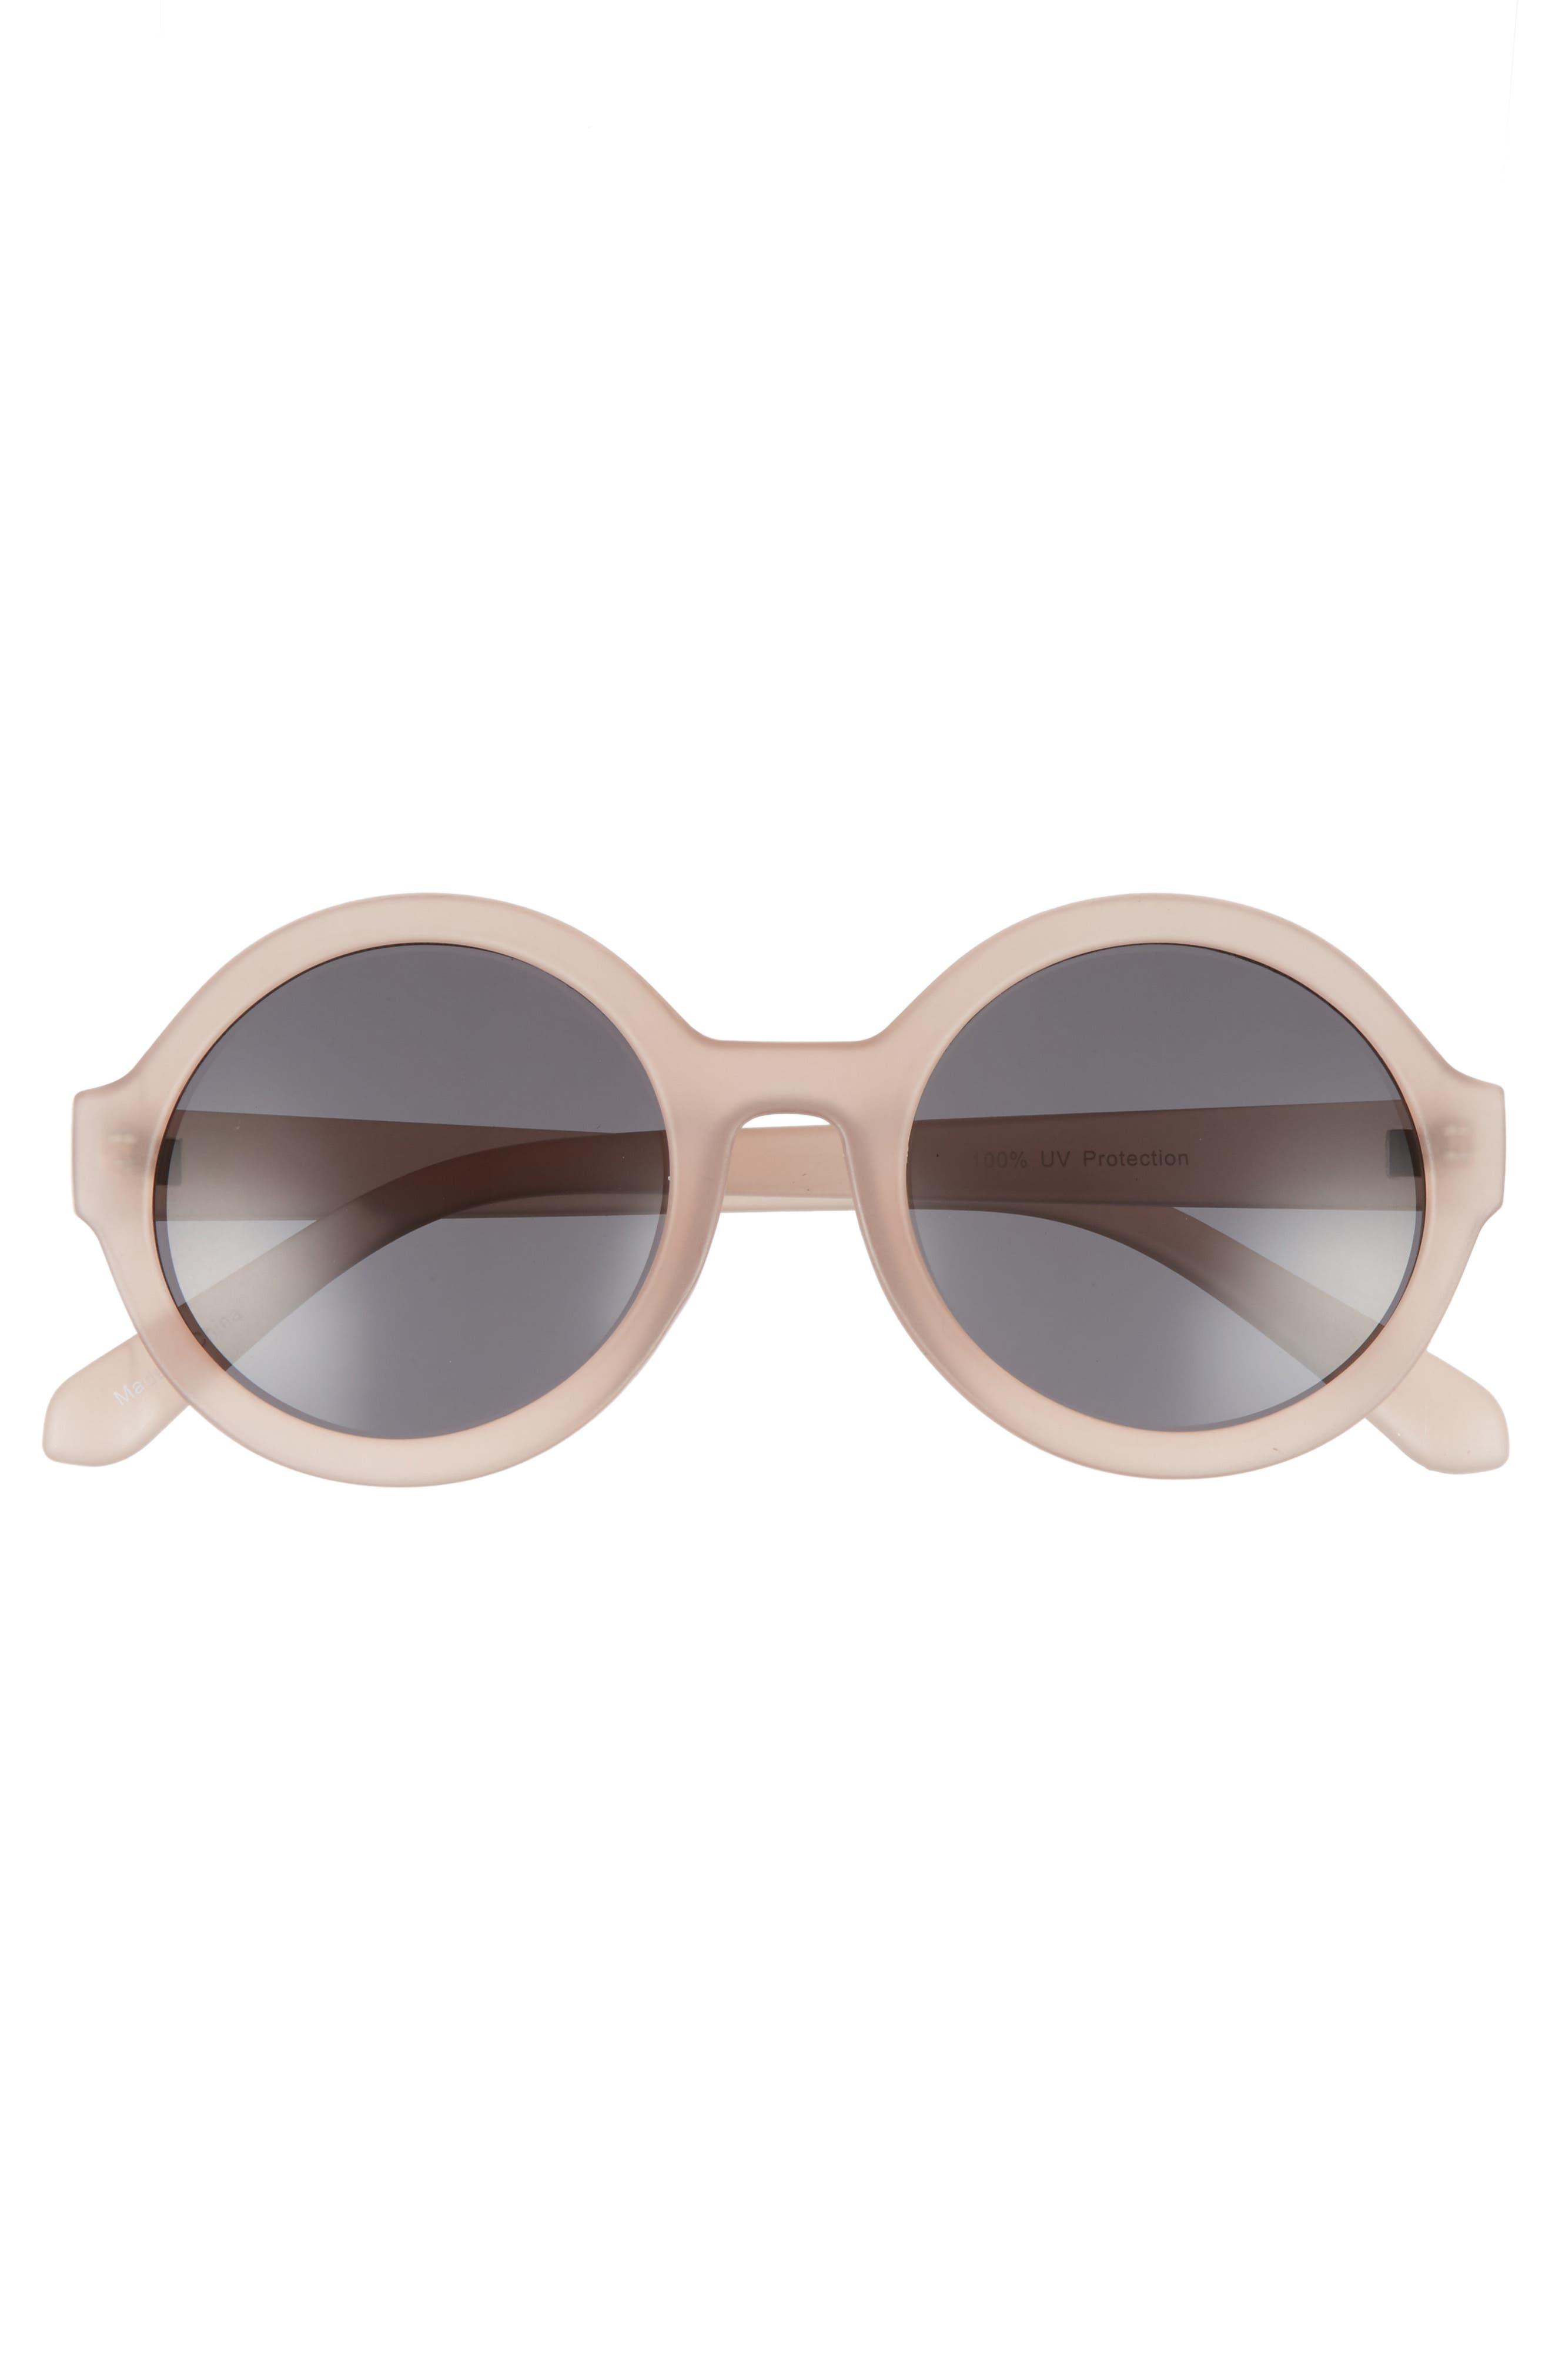 50mm Round Sunglasses,                             Alternate thumbnail 3, color,                             650